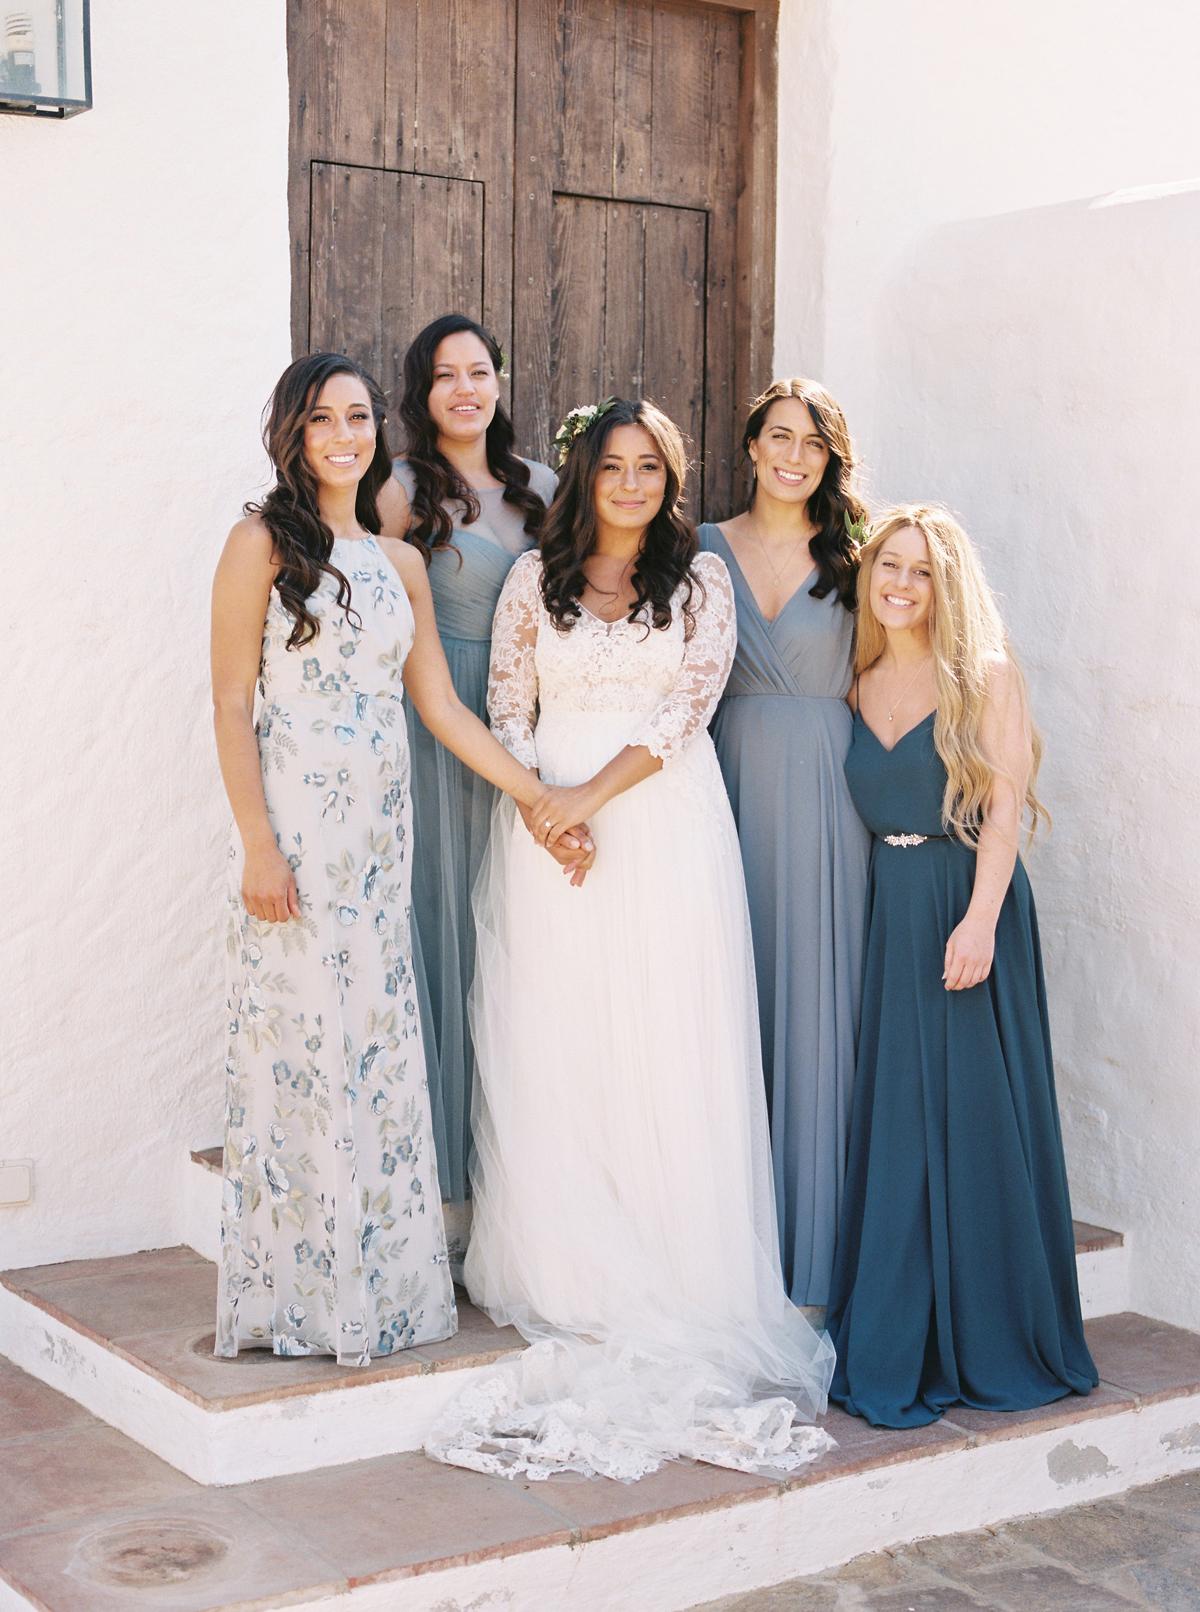 daphne jack wedding spain bridesmaids